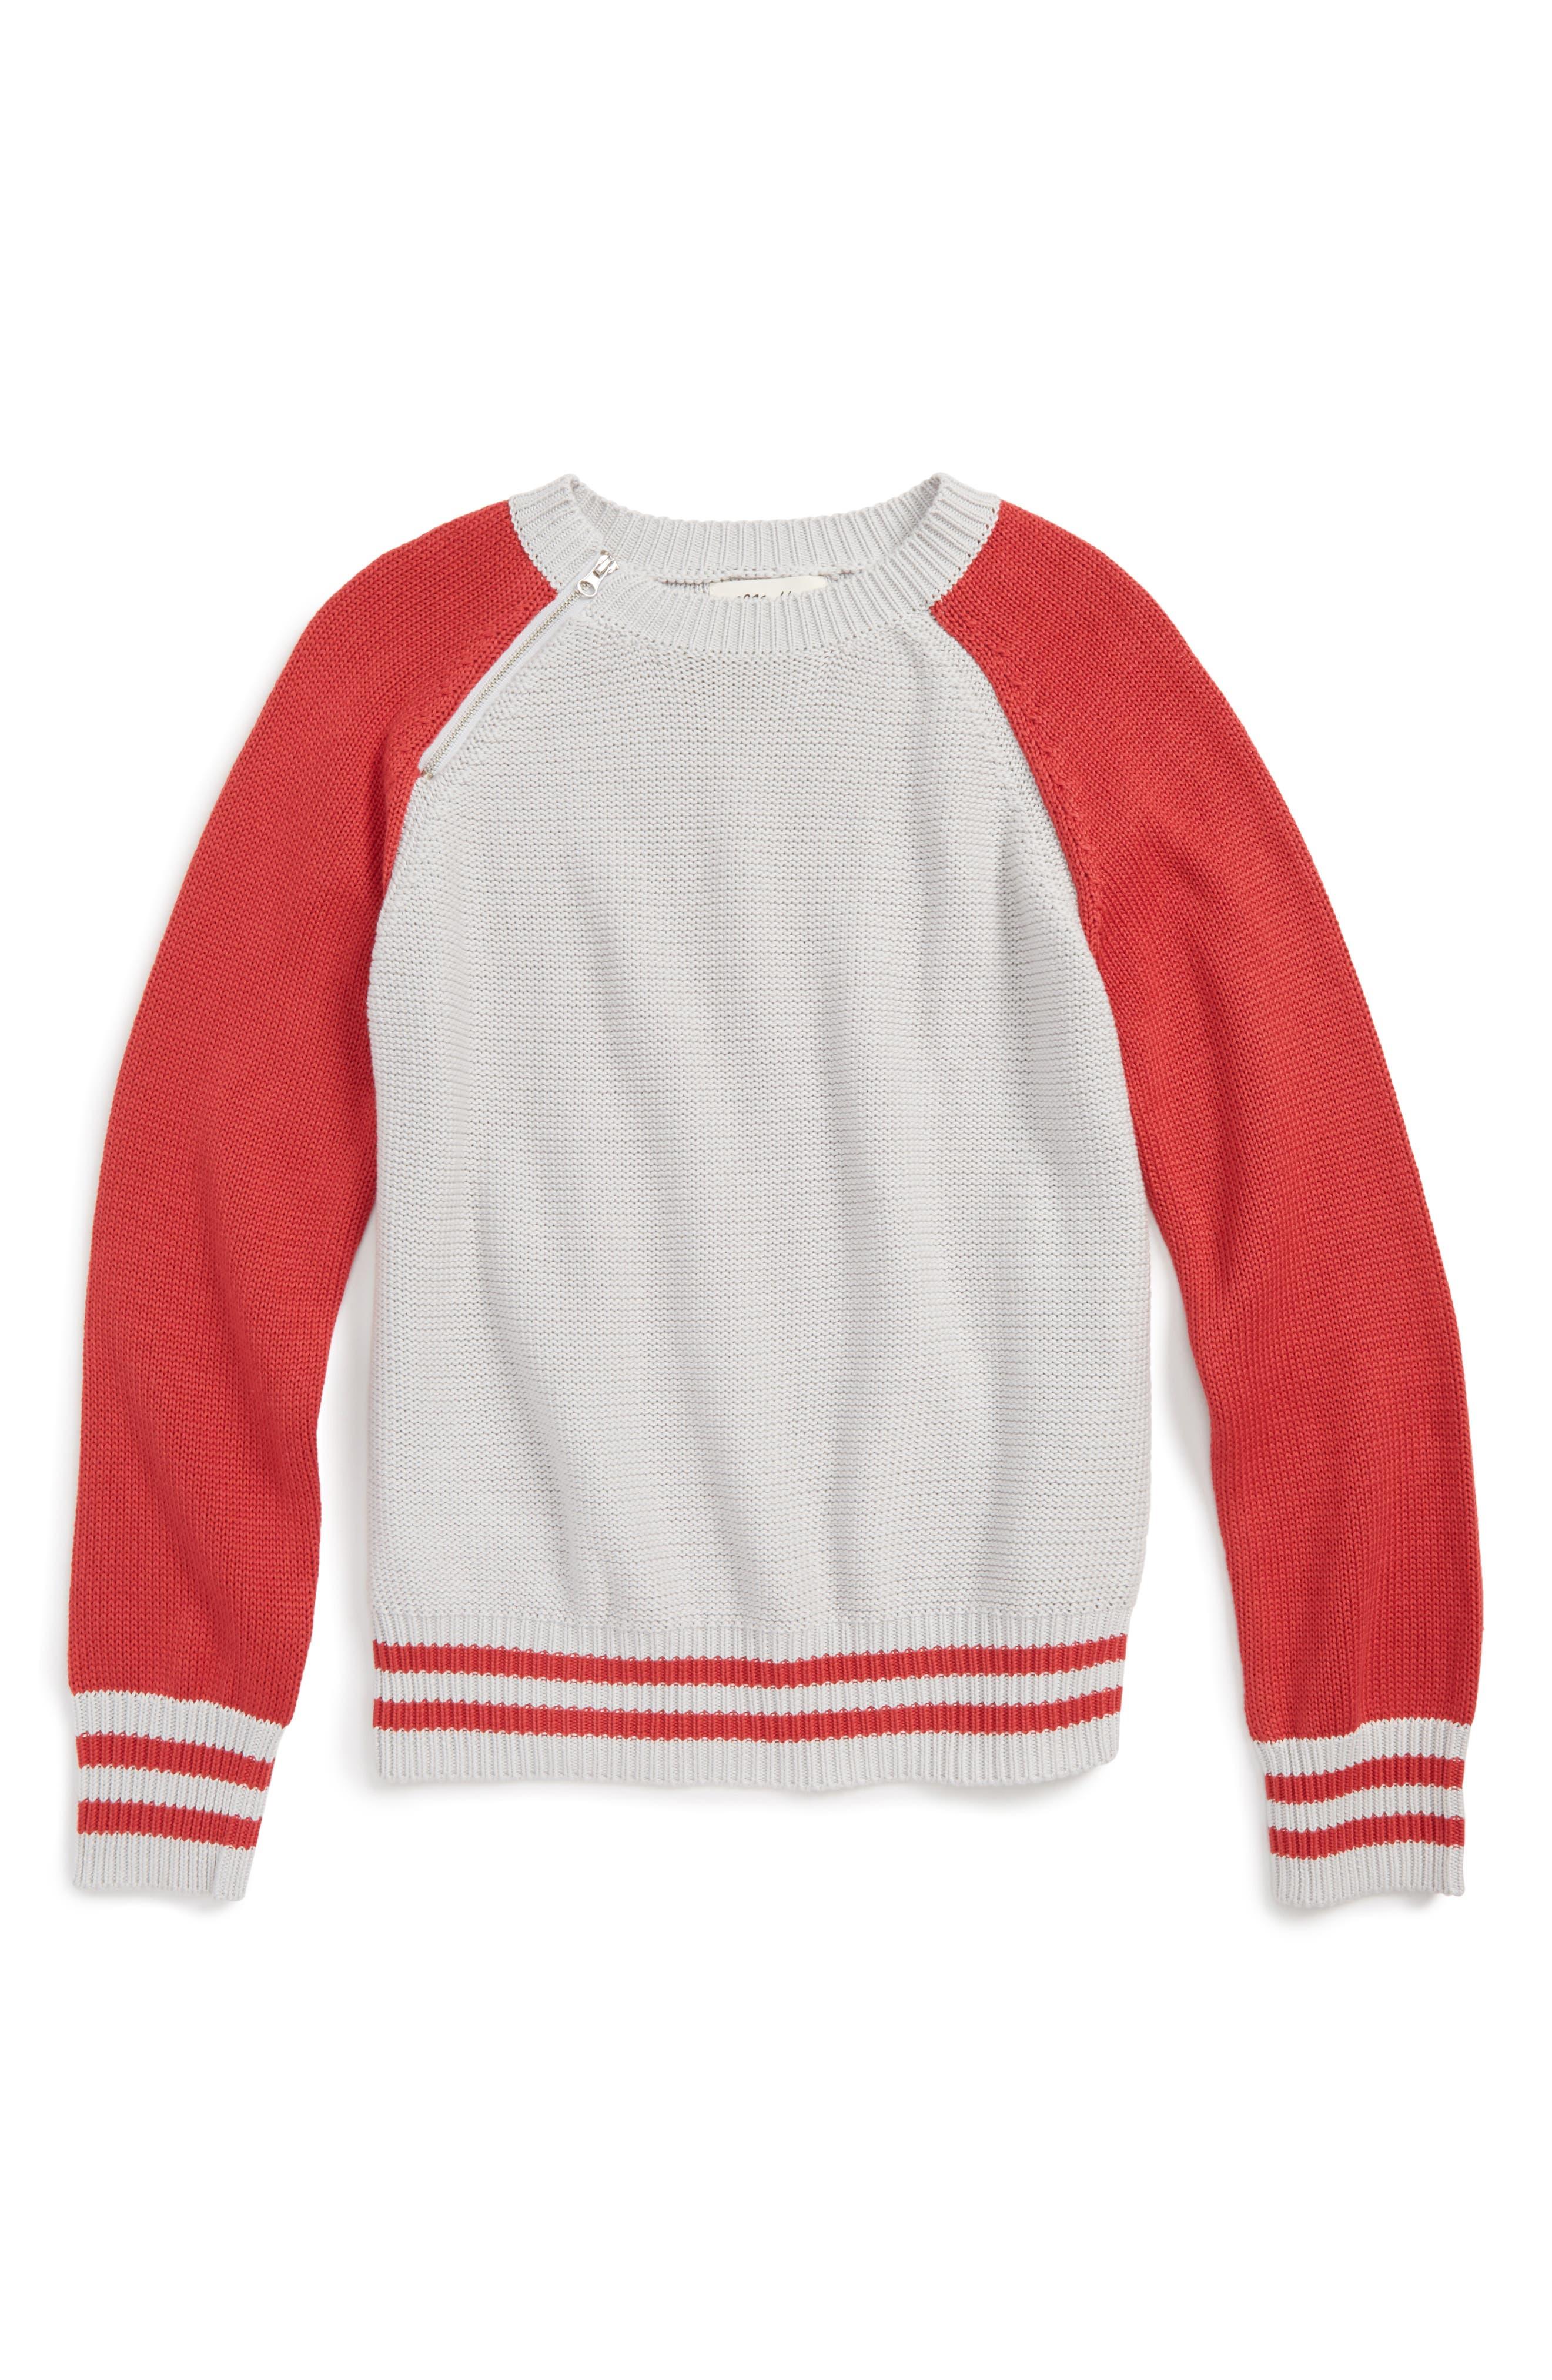 Alternate Image 1 Selected - Maddie Colorblock Raglan Sweater (Big Girls)